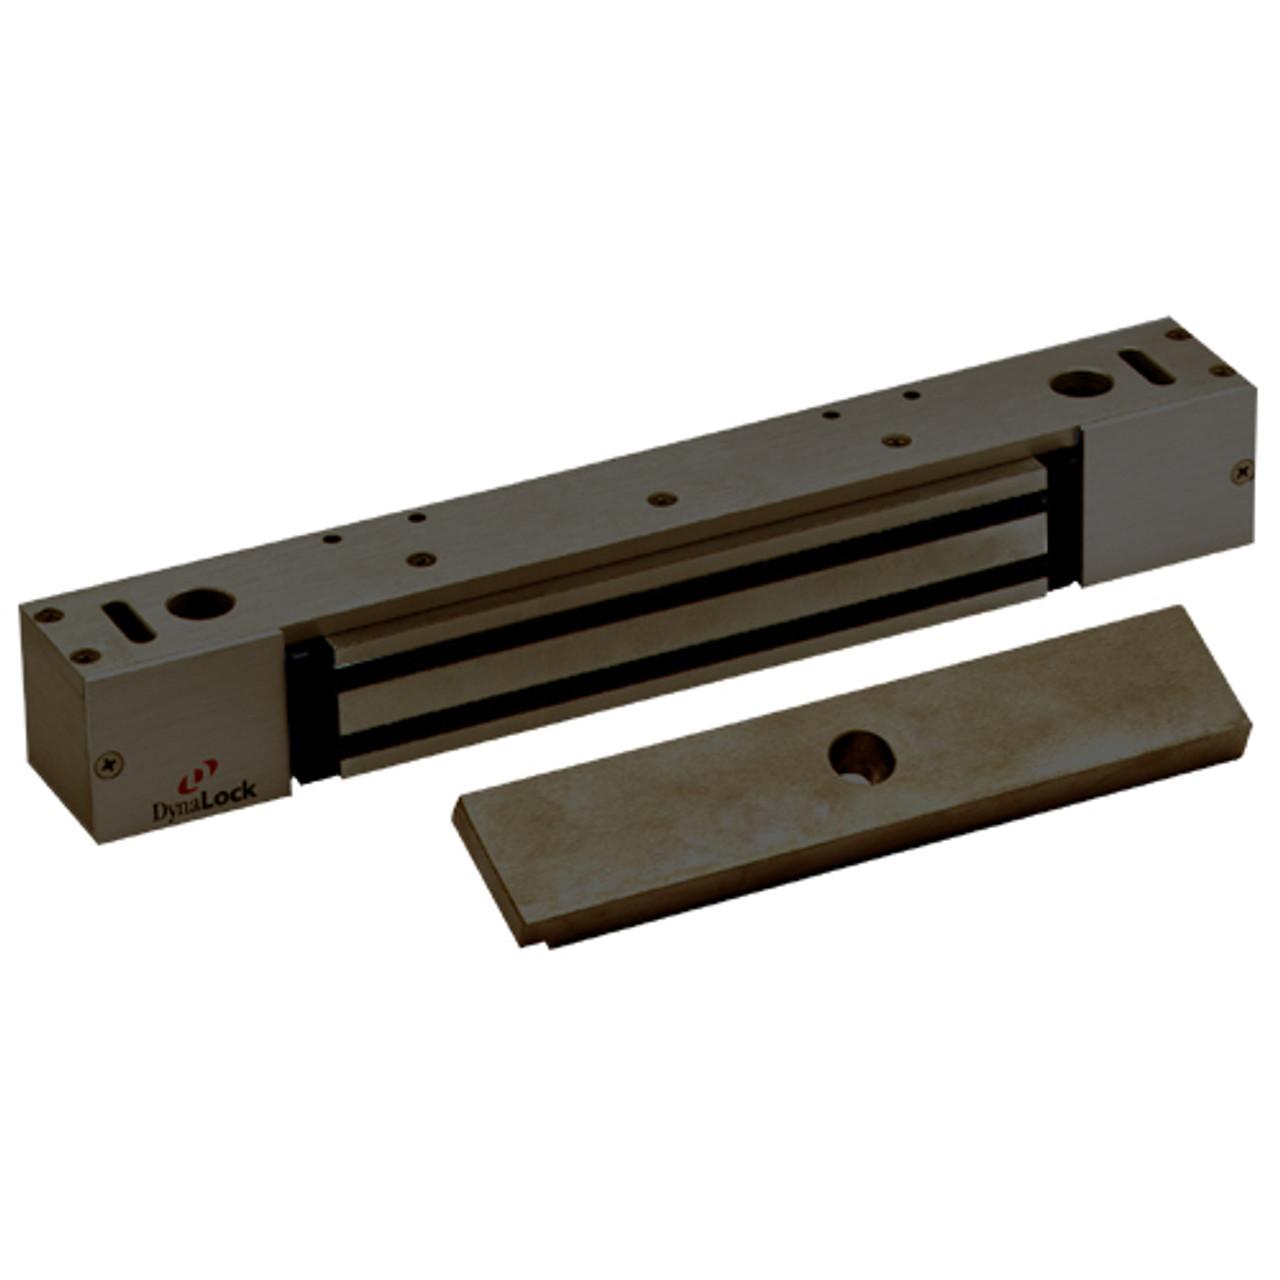 2268-10-US10B-DYN DynaLock 2268 Series Single Classic Low Profile Electromagnetic Lock for Outswing Door with DYN in Oil Rubbed Bronze